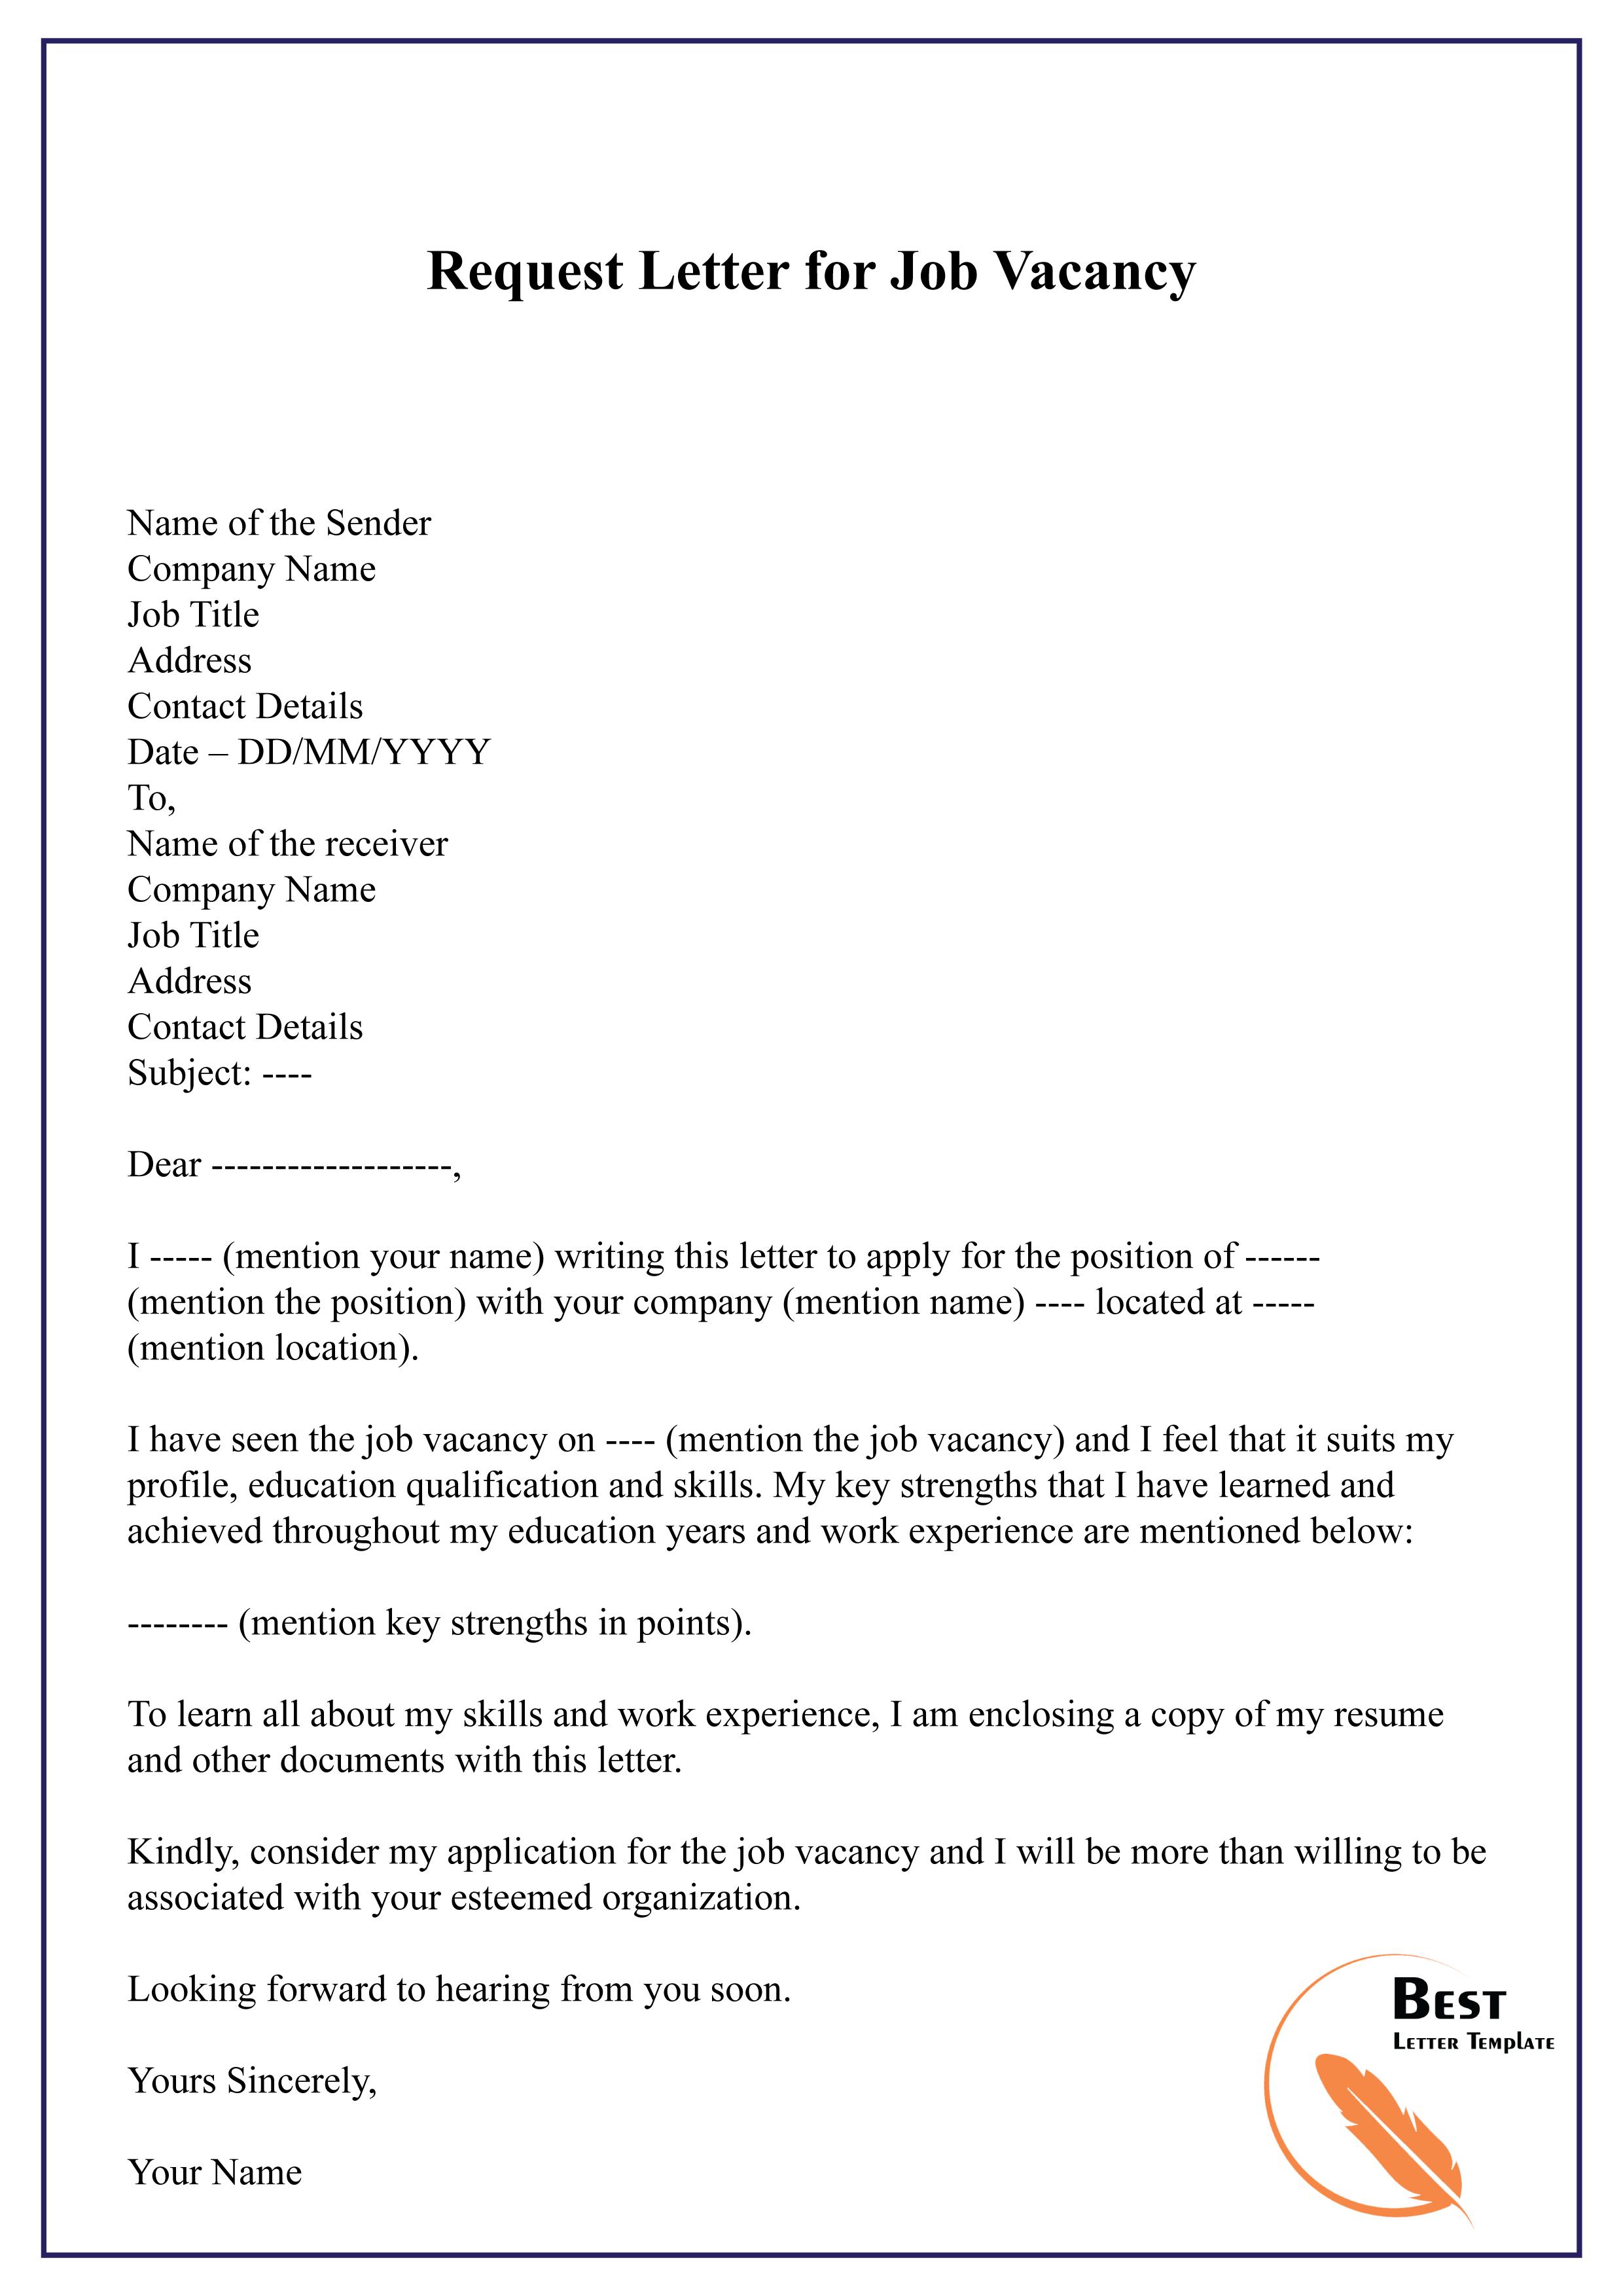 Request Letter For Job Opportunity from bestlettertemplate.com